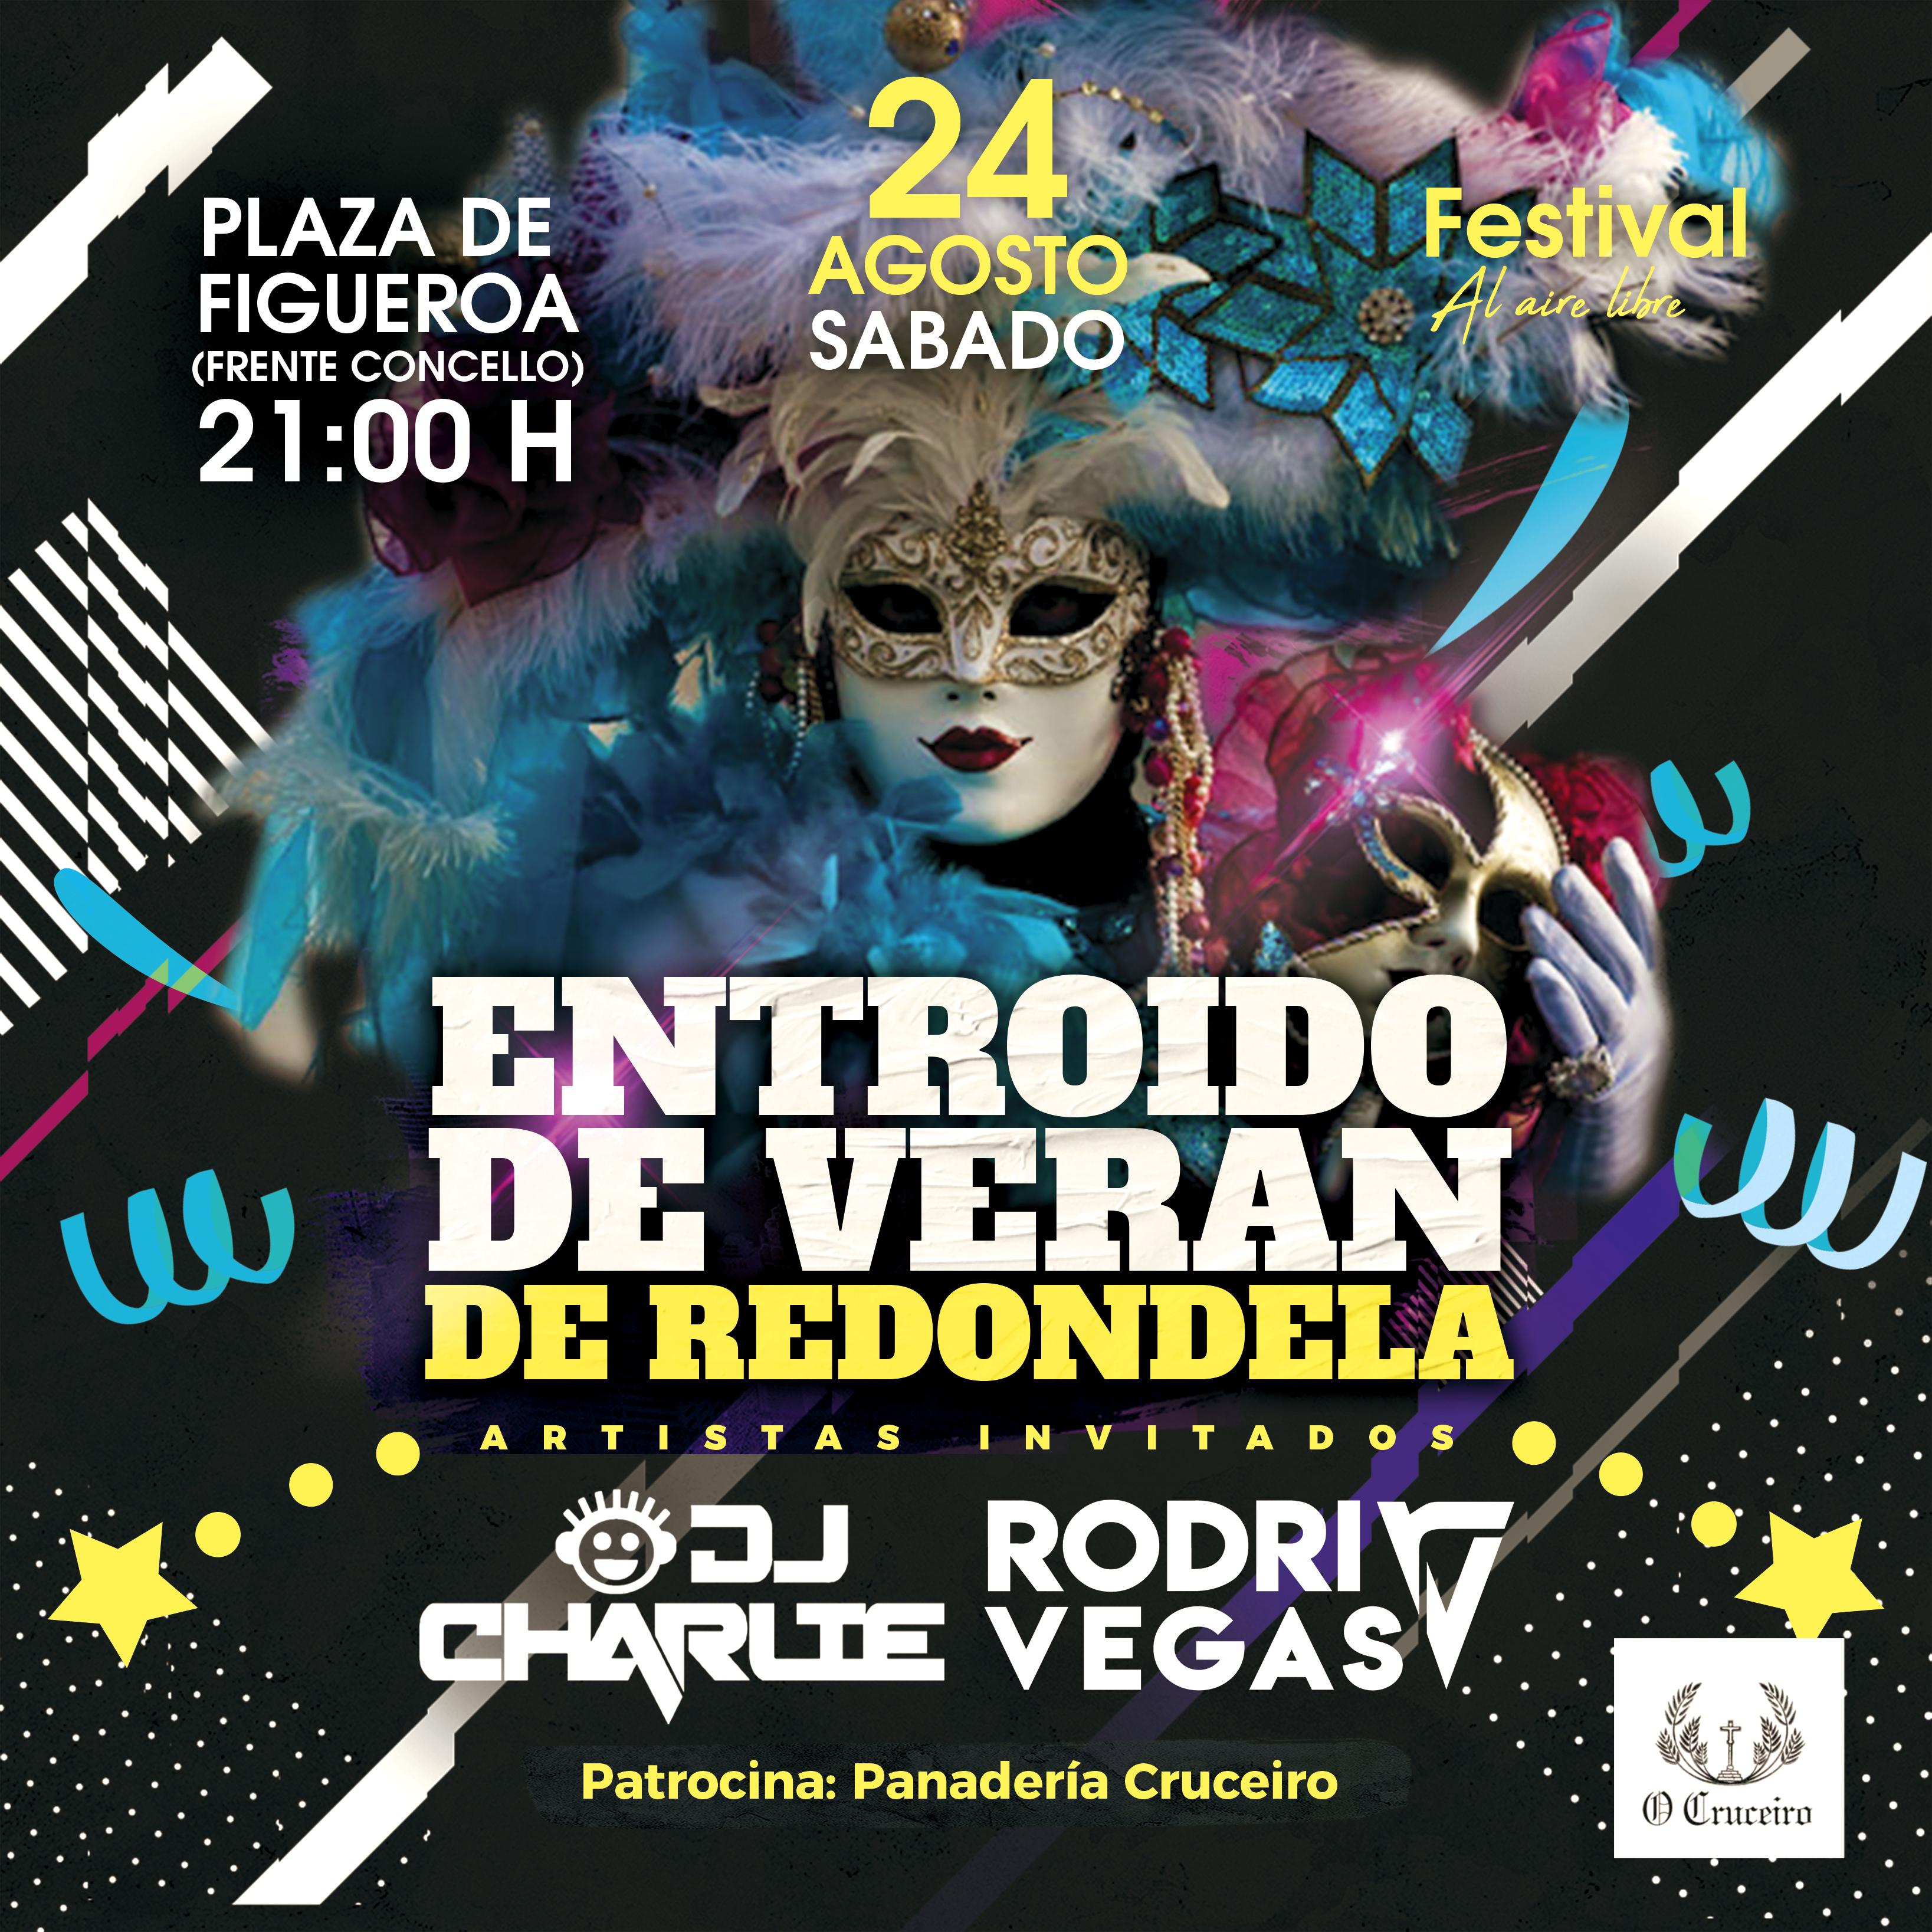 24-08-2019-Carnaval-de-verano-Redondela